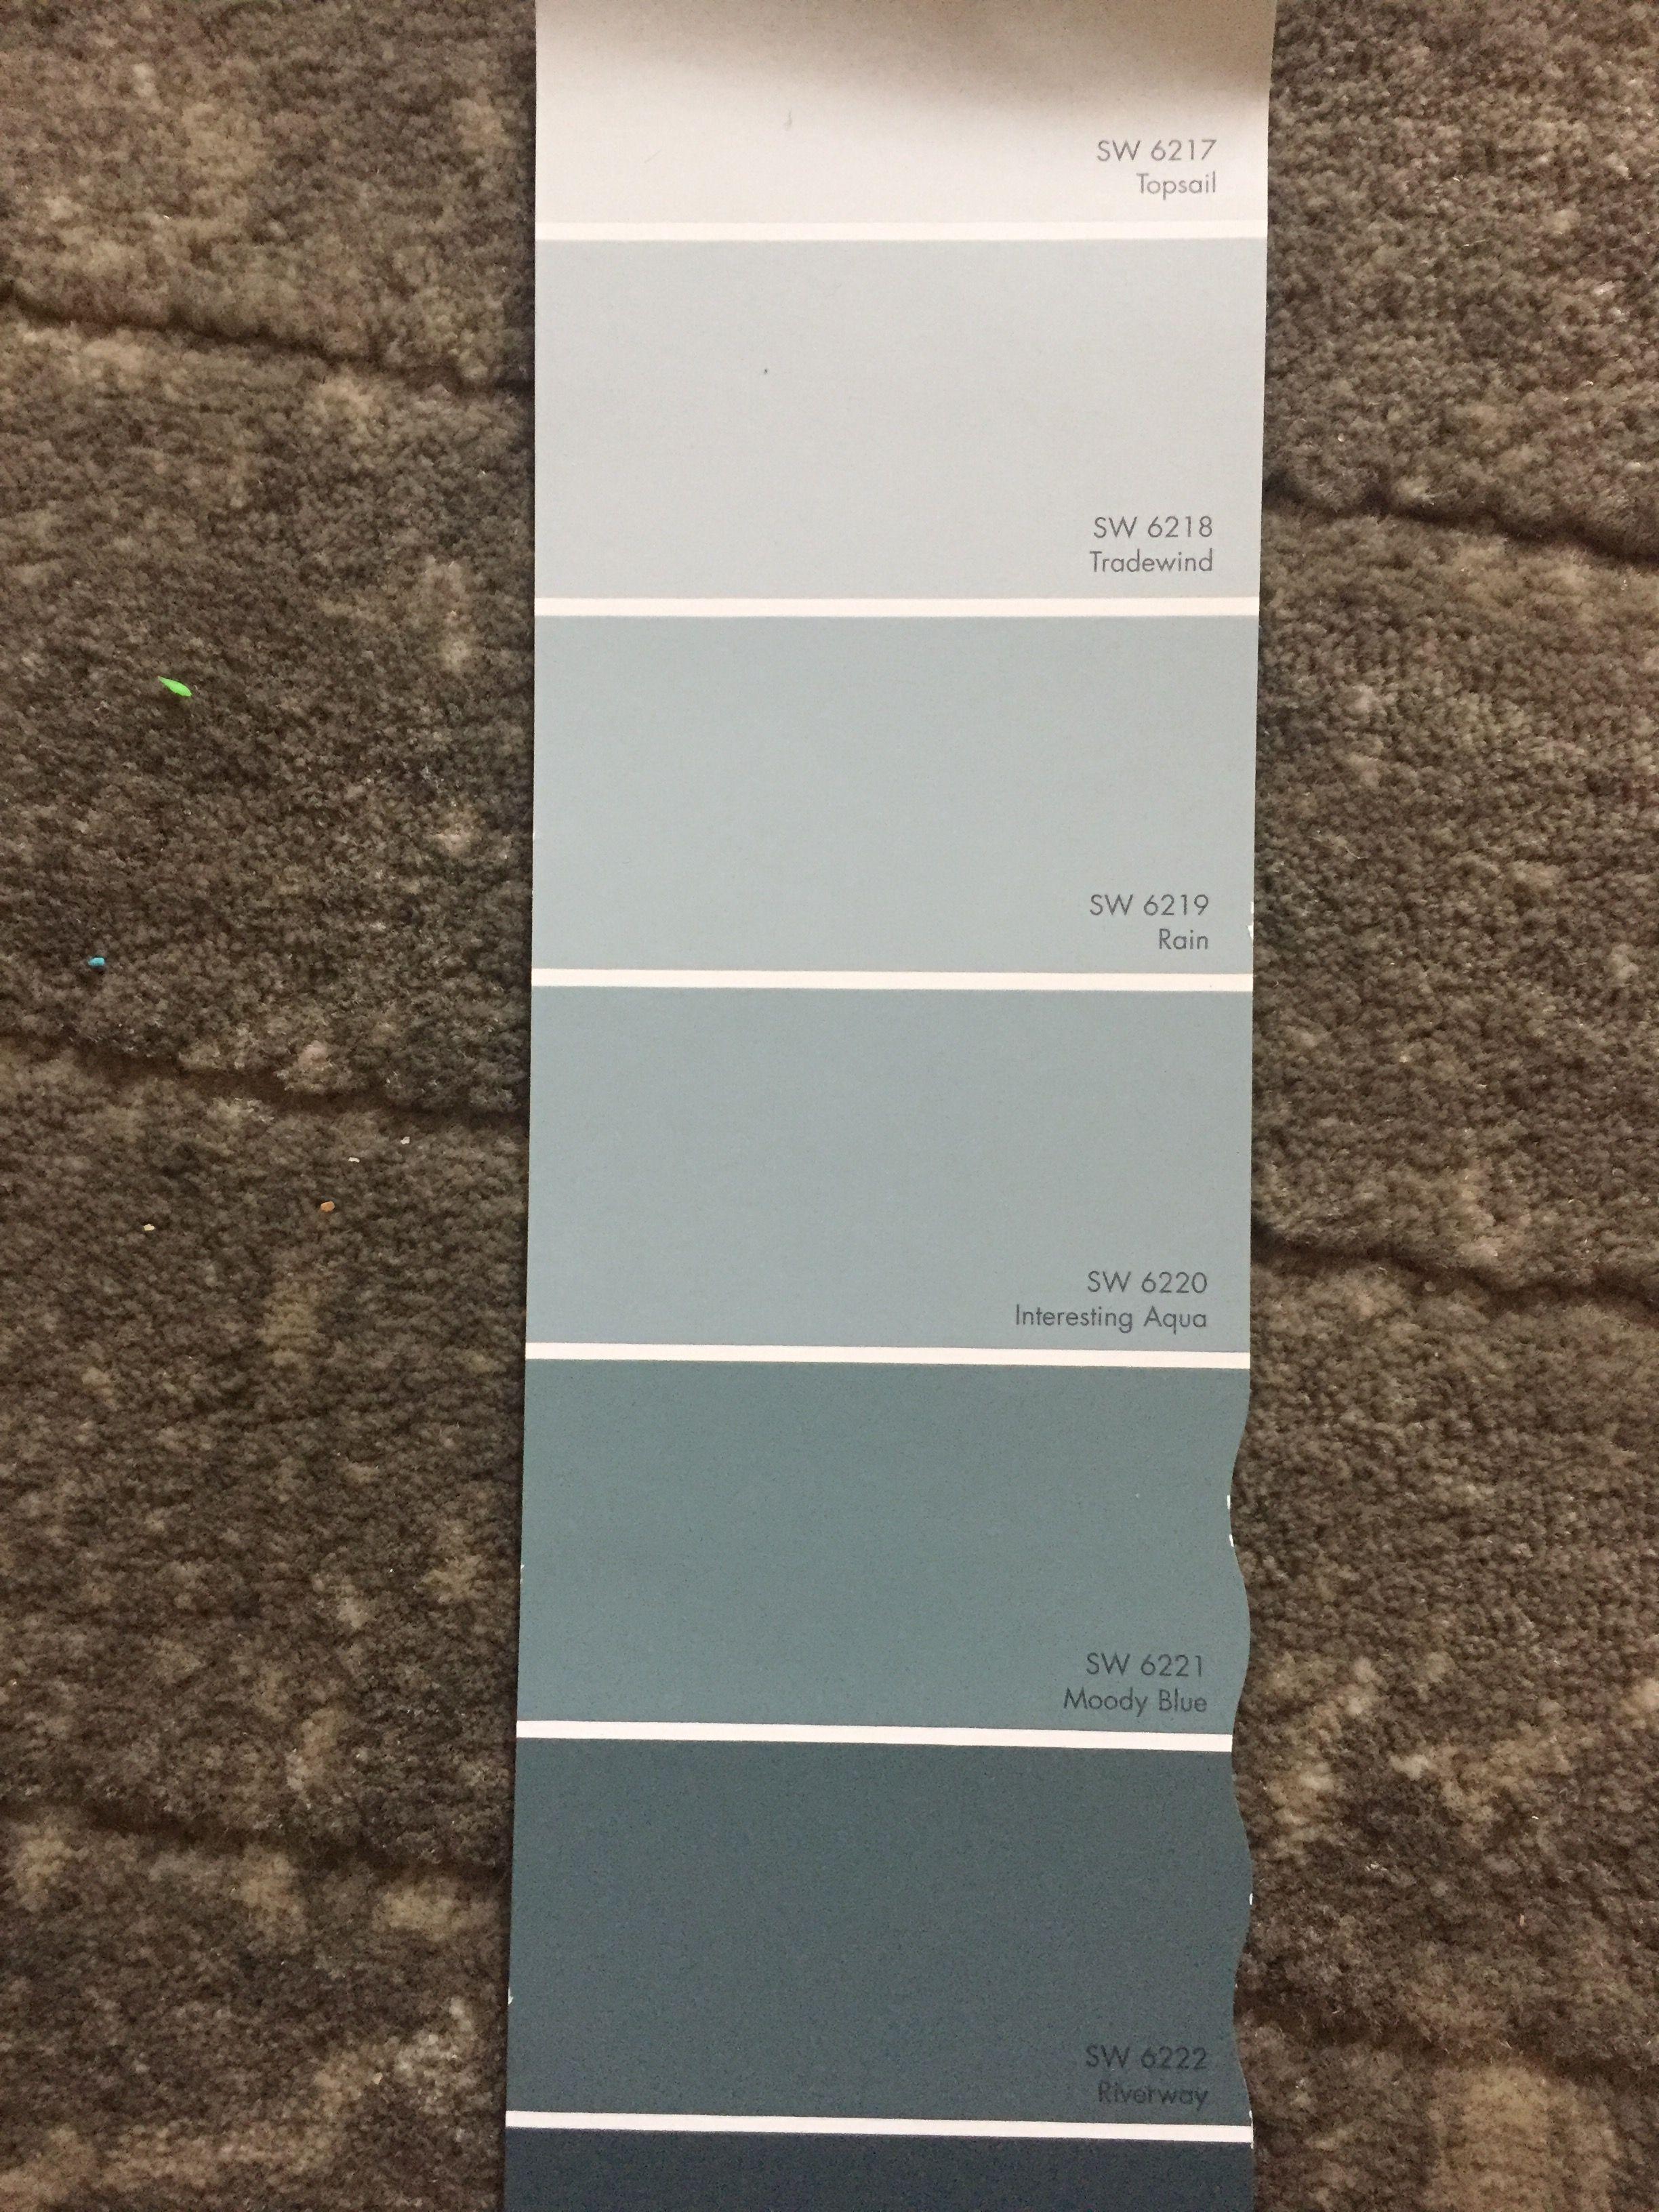 Sherwin Williams Tradewind Topsail Rain Bedroom Paint Colors